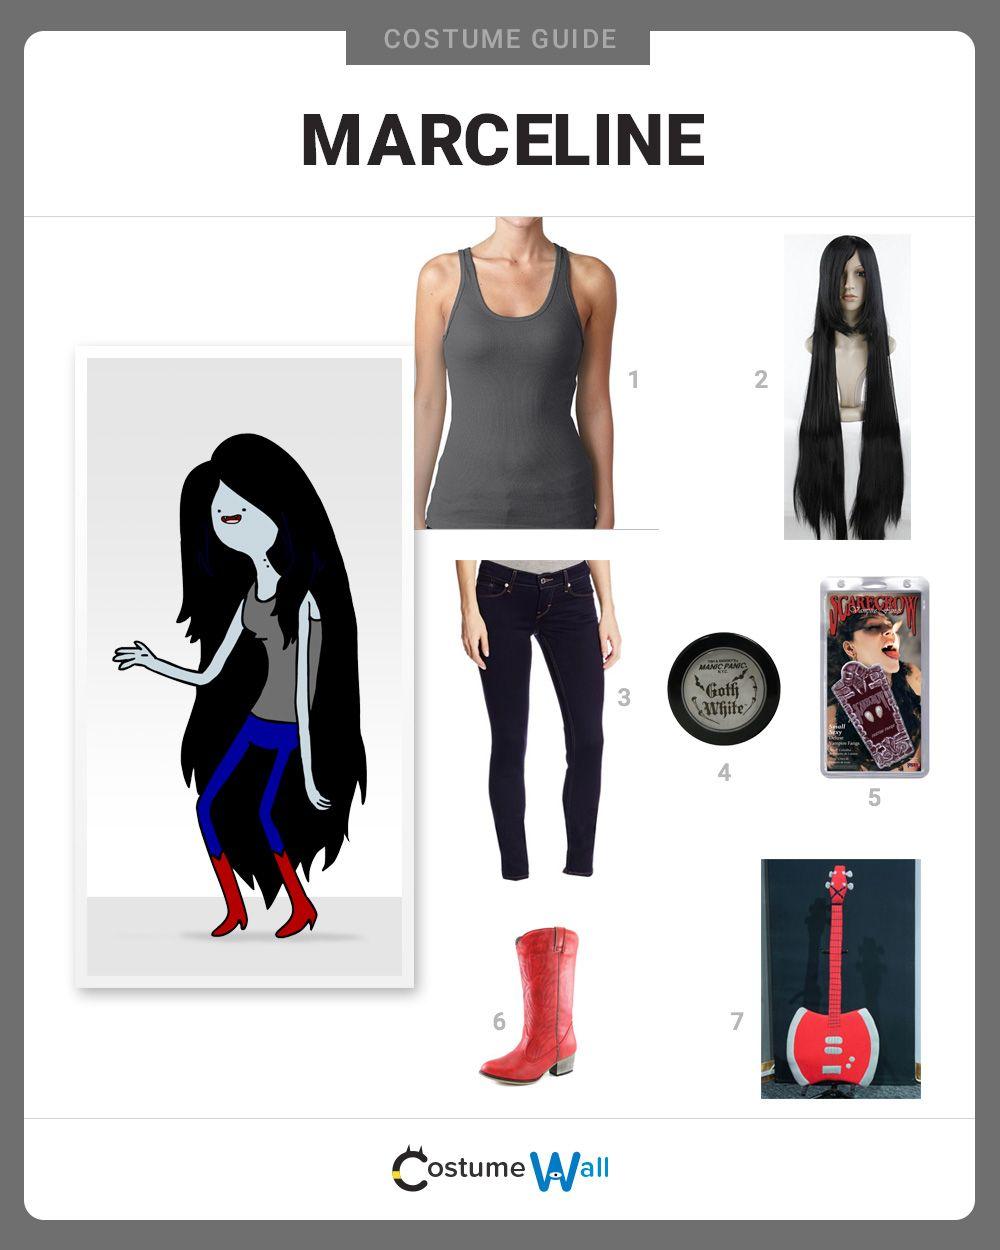 Adventure time costumes marceline